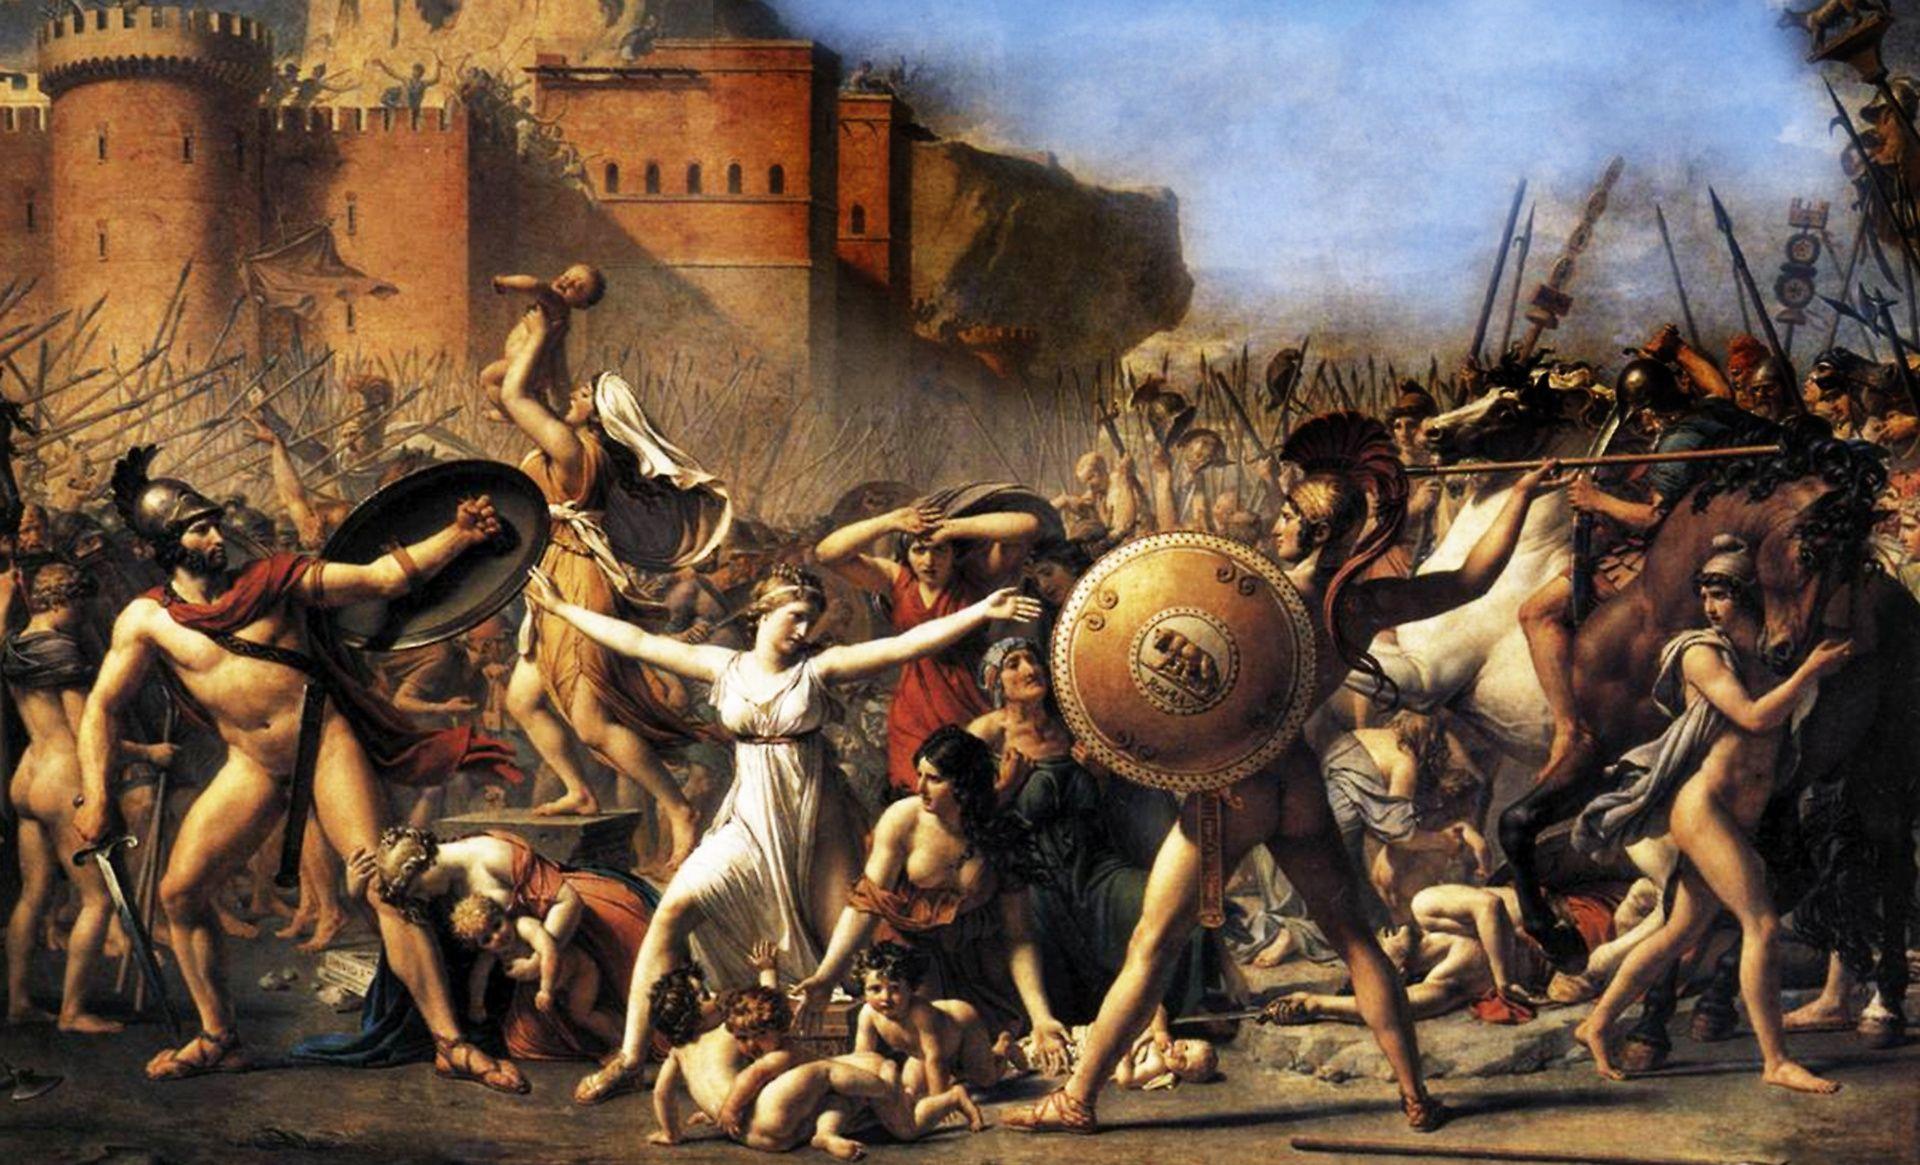 Figura 23 - Jacques-Louis David, As sabinas